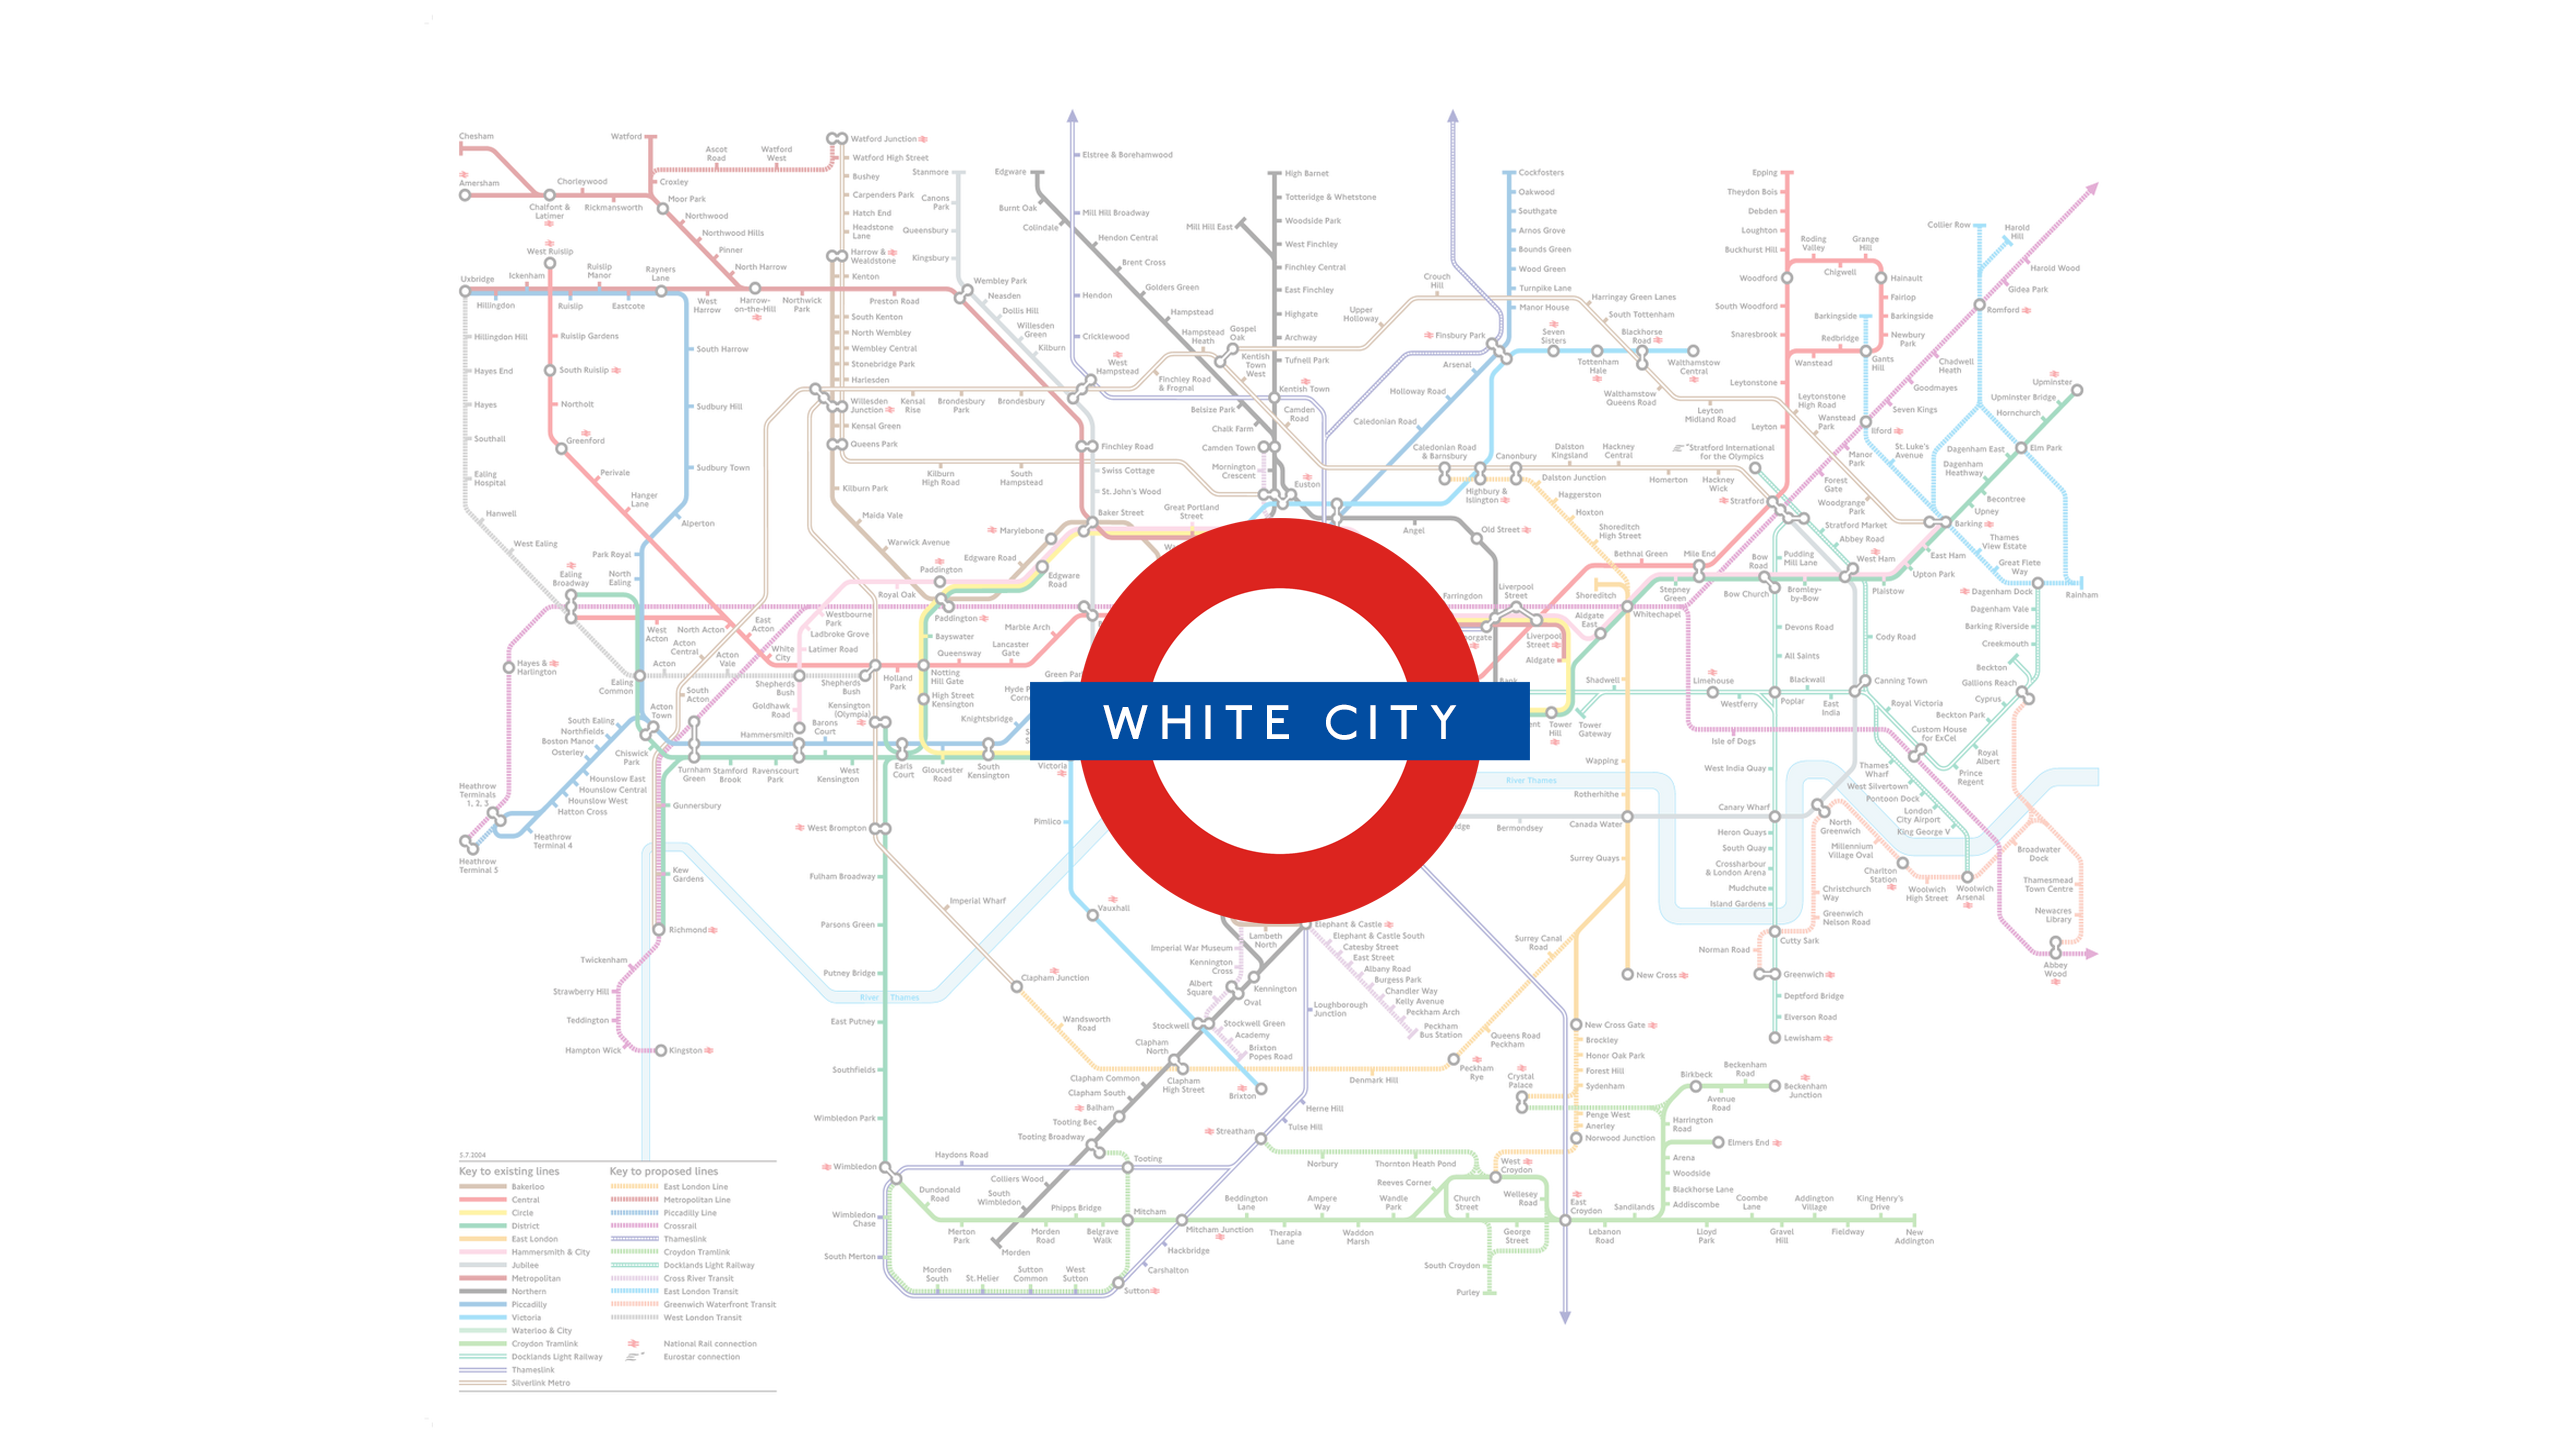 White City (Map)